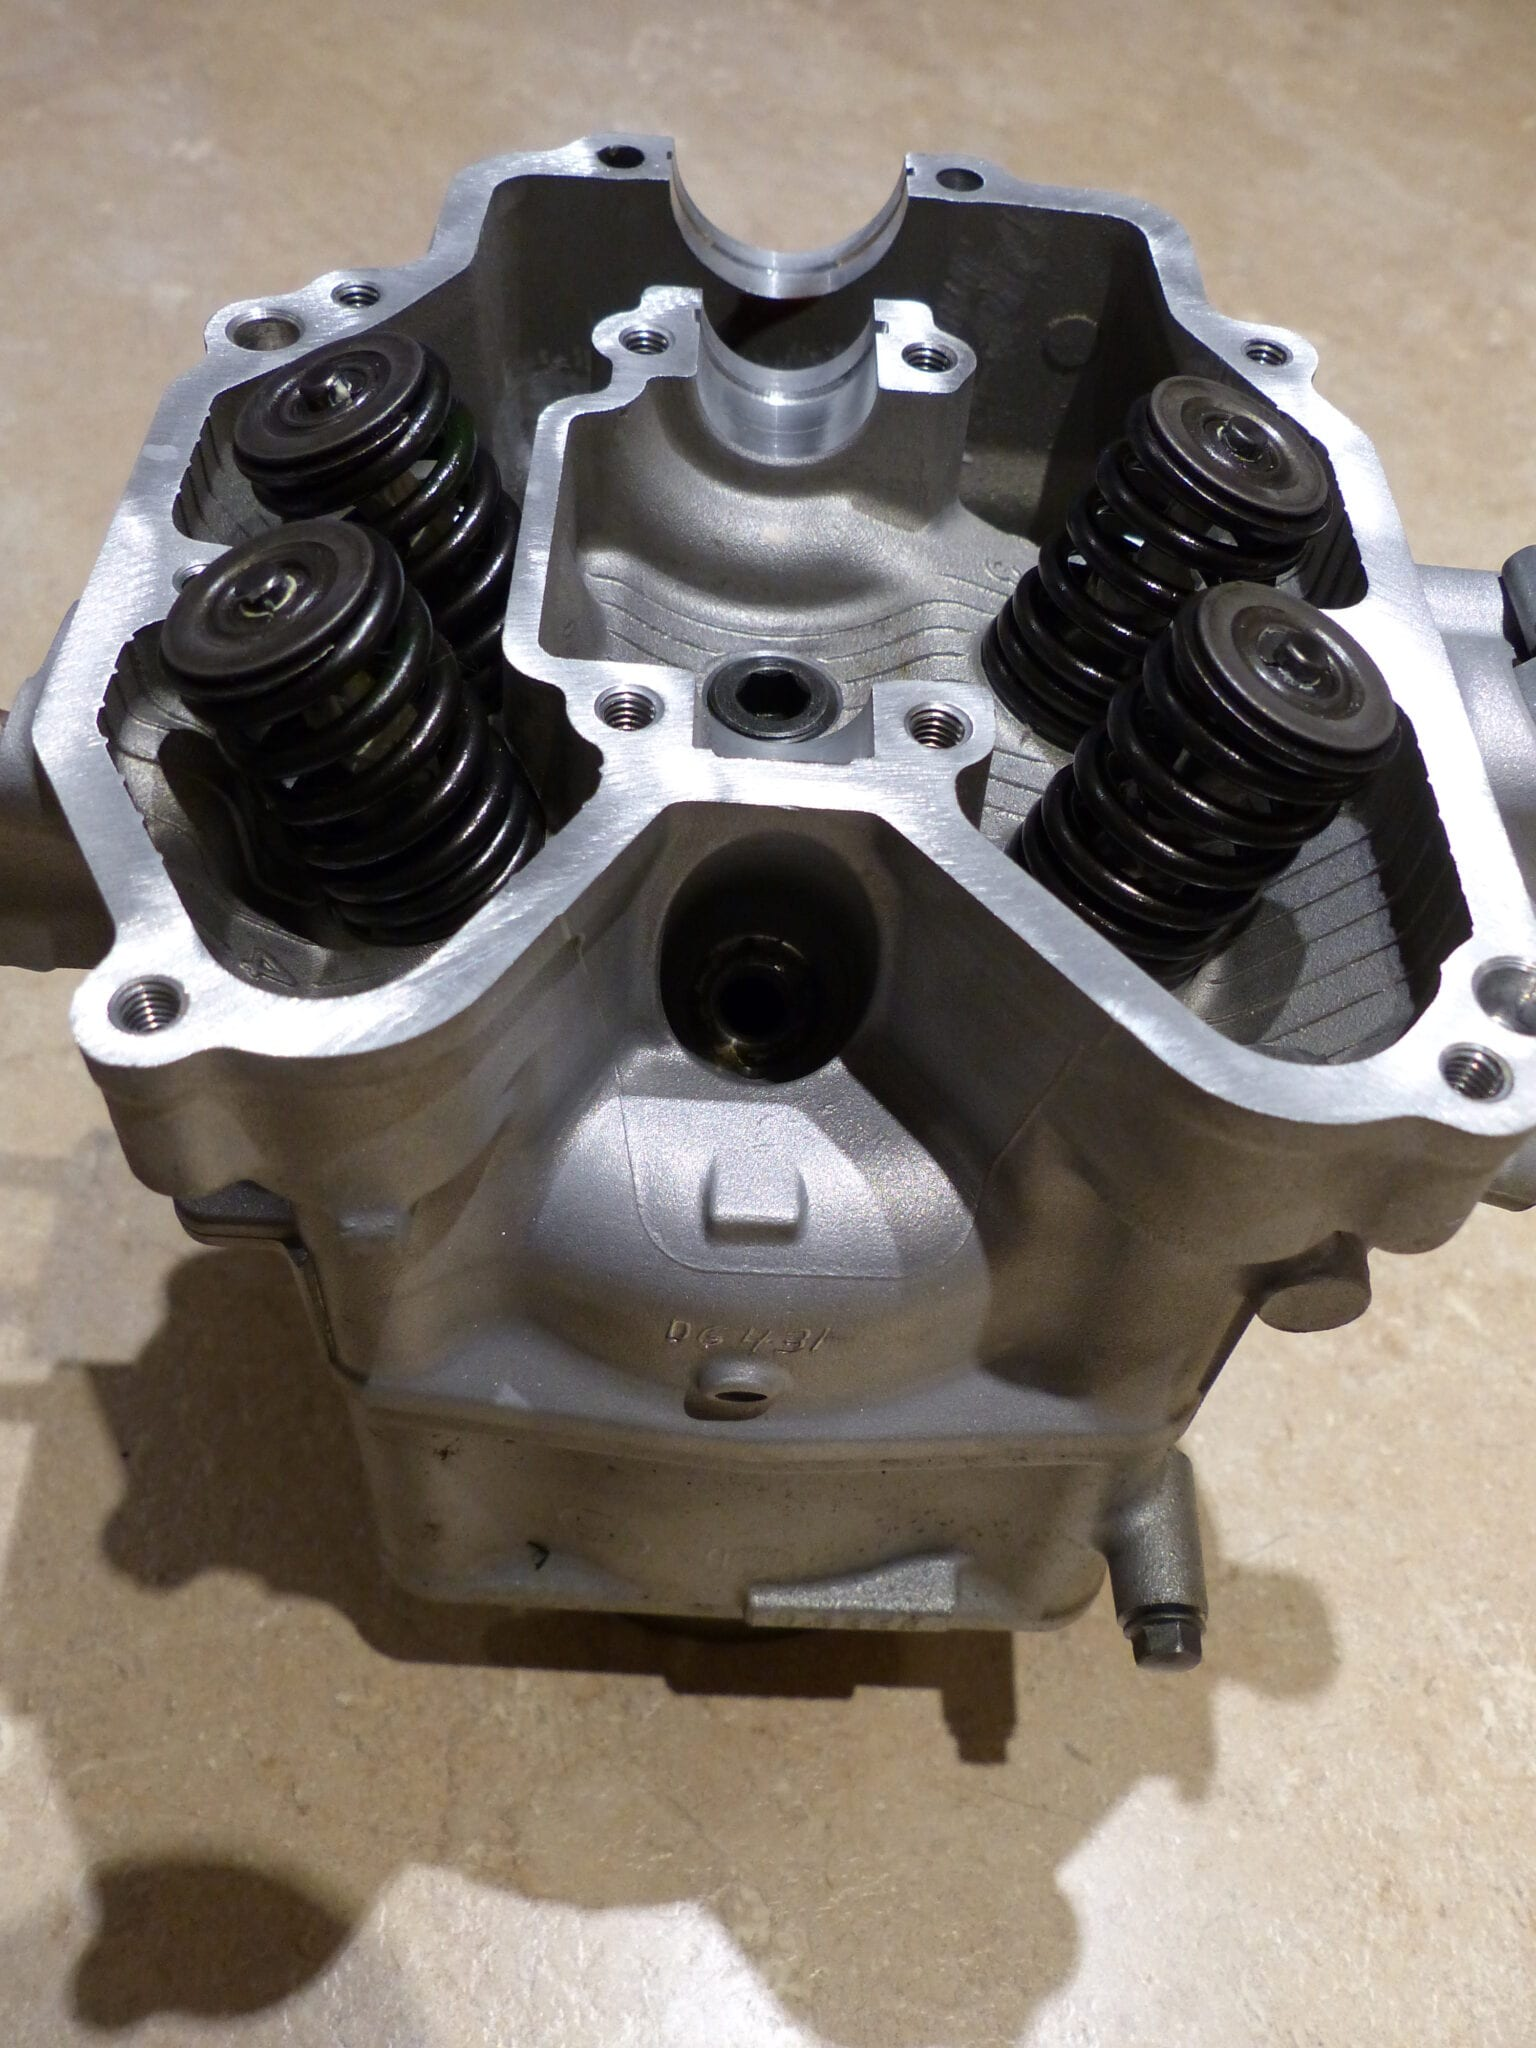 Improving engine performance